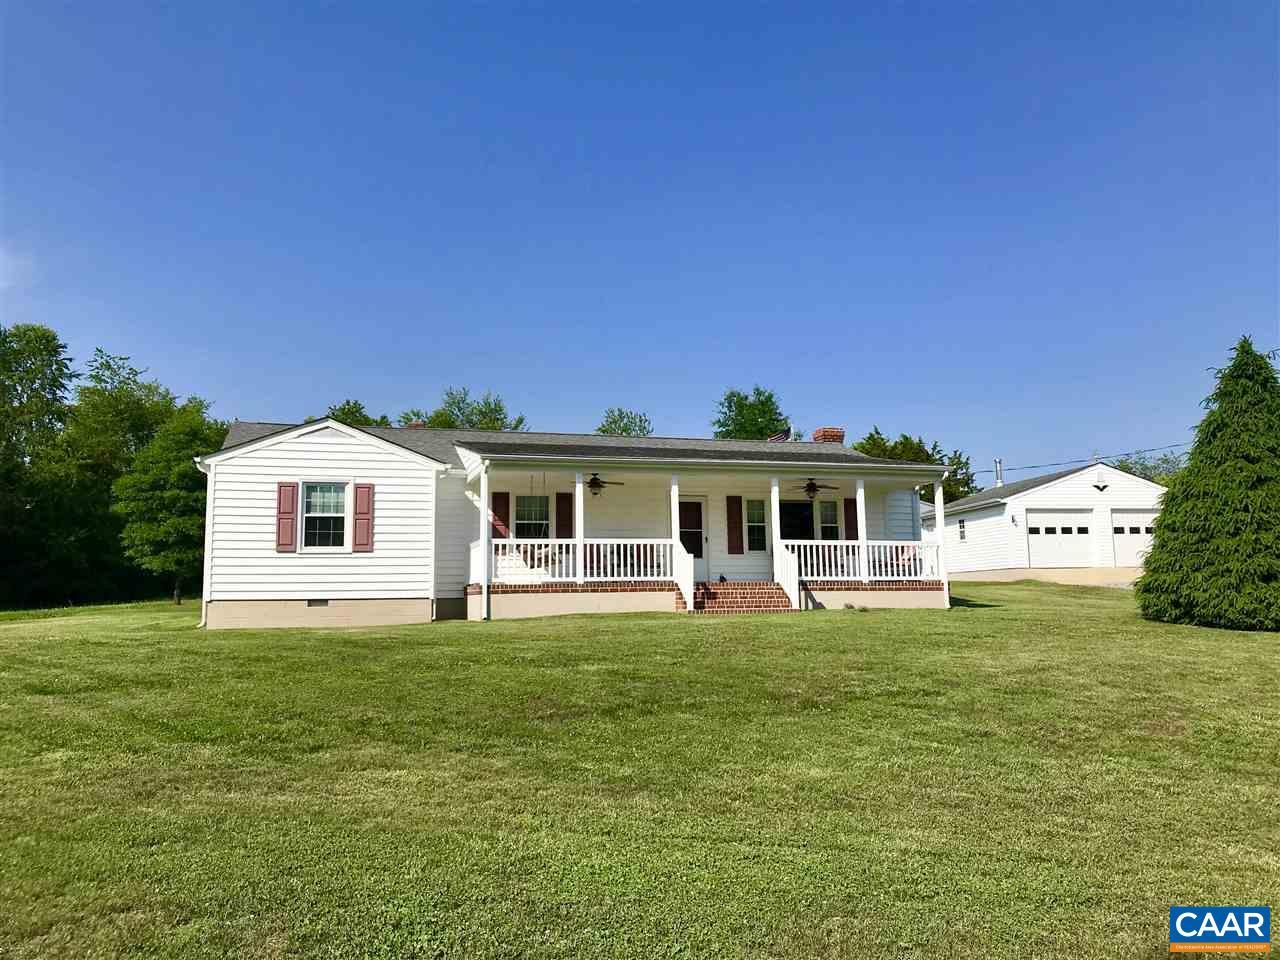 1230 GAMMON TOWN RD, BUMPASS, VA 23024